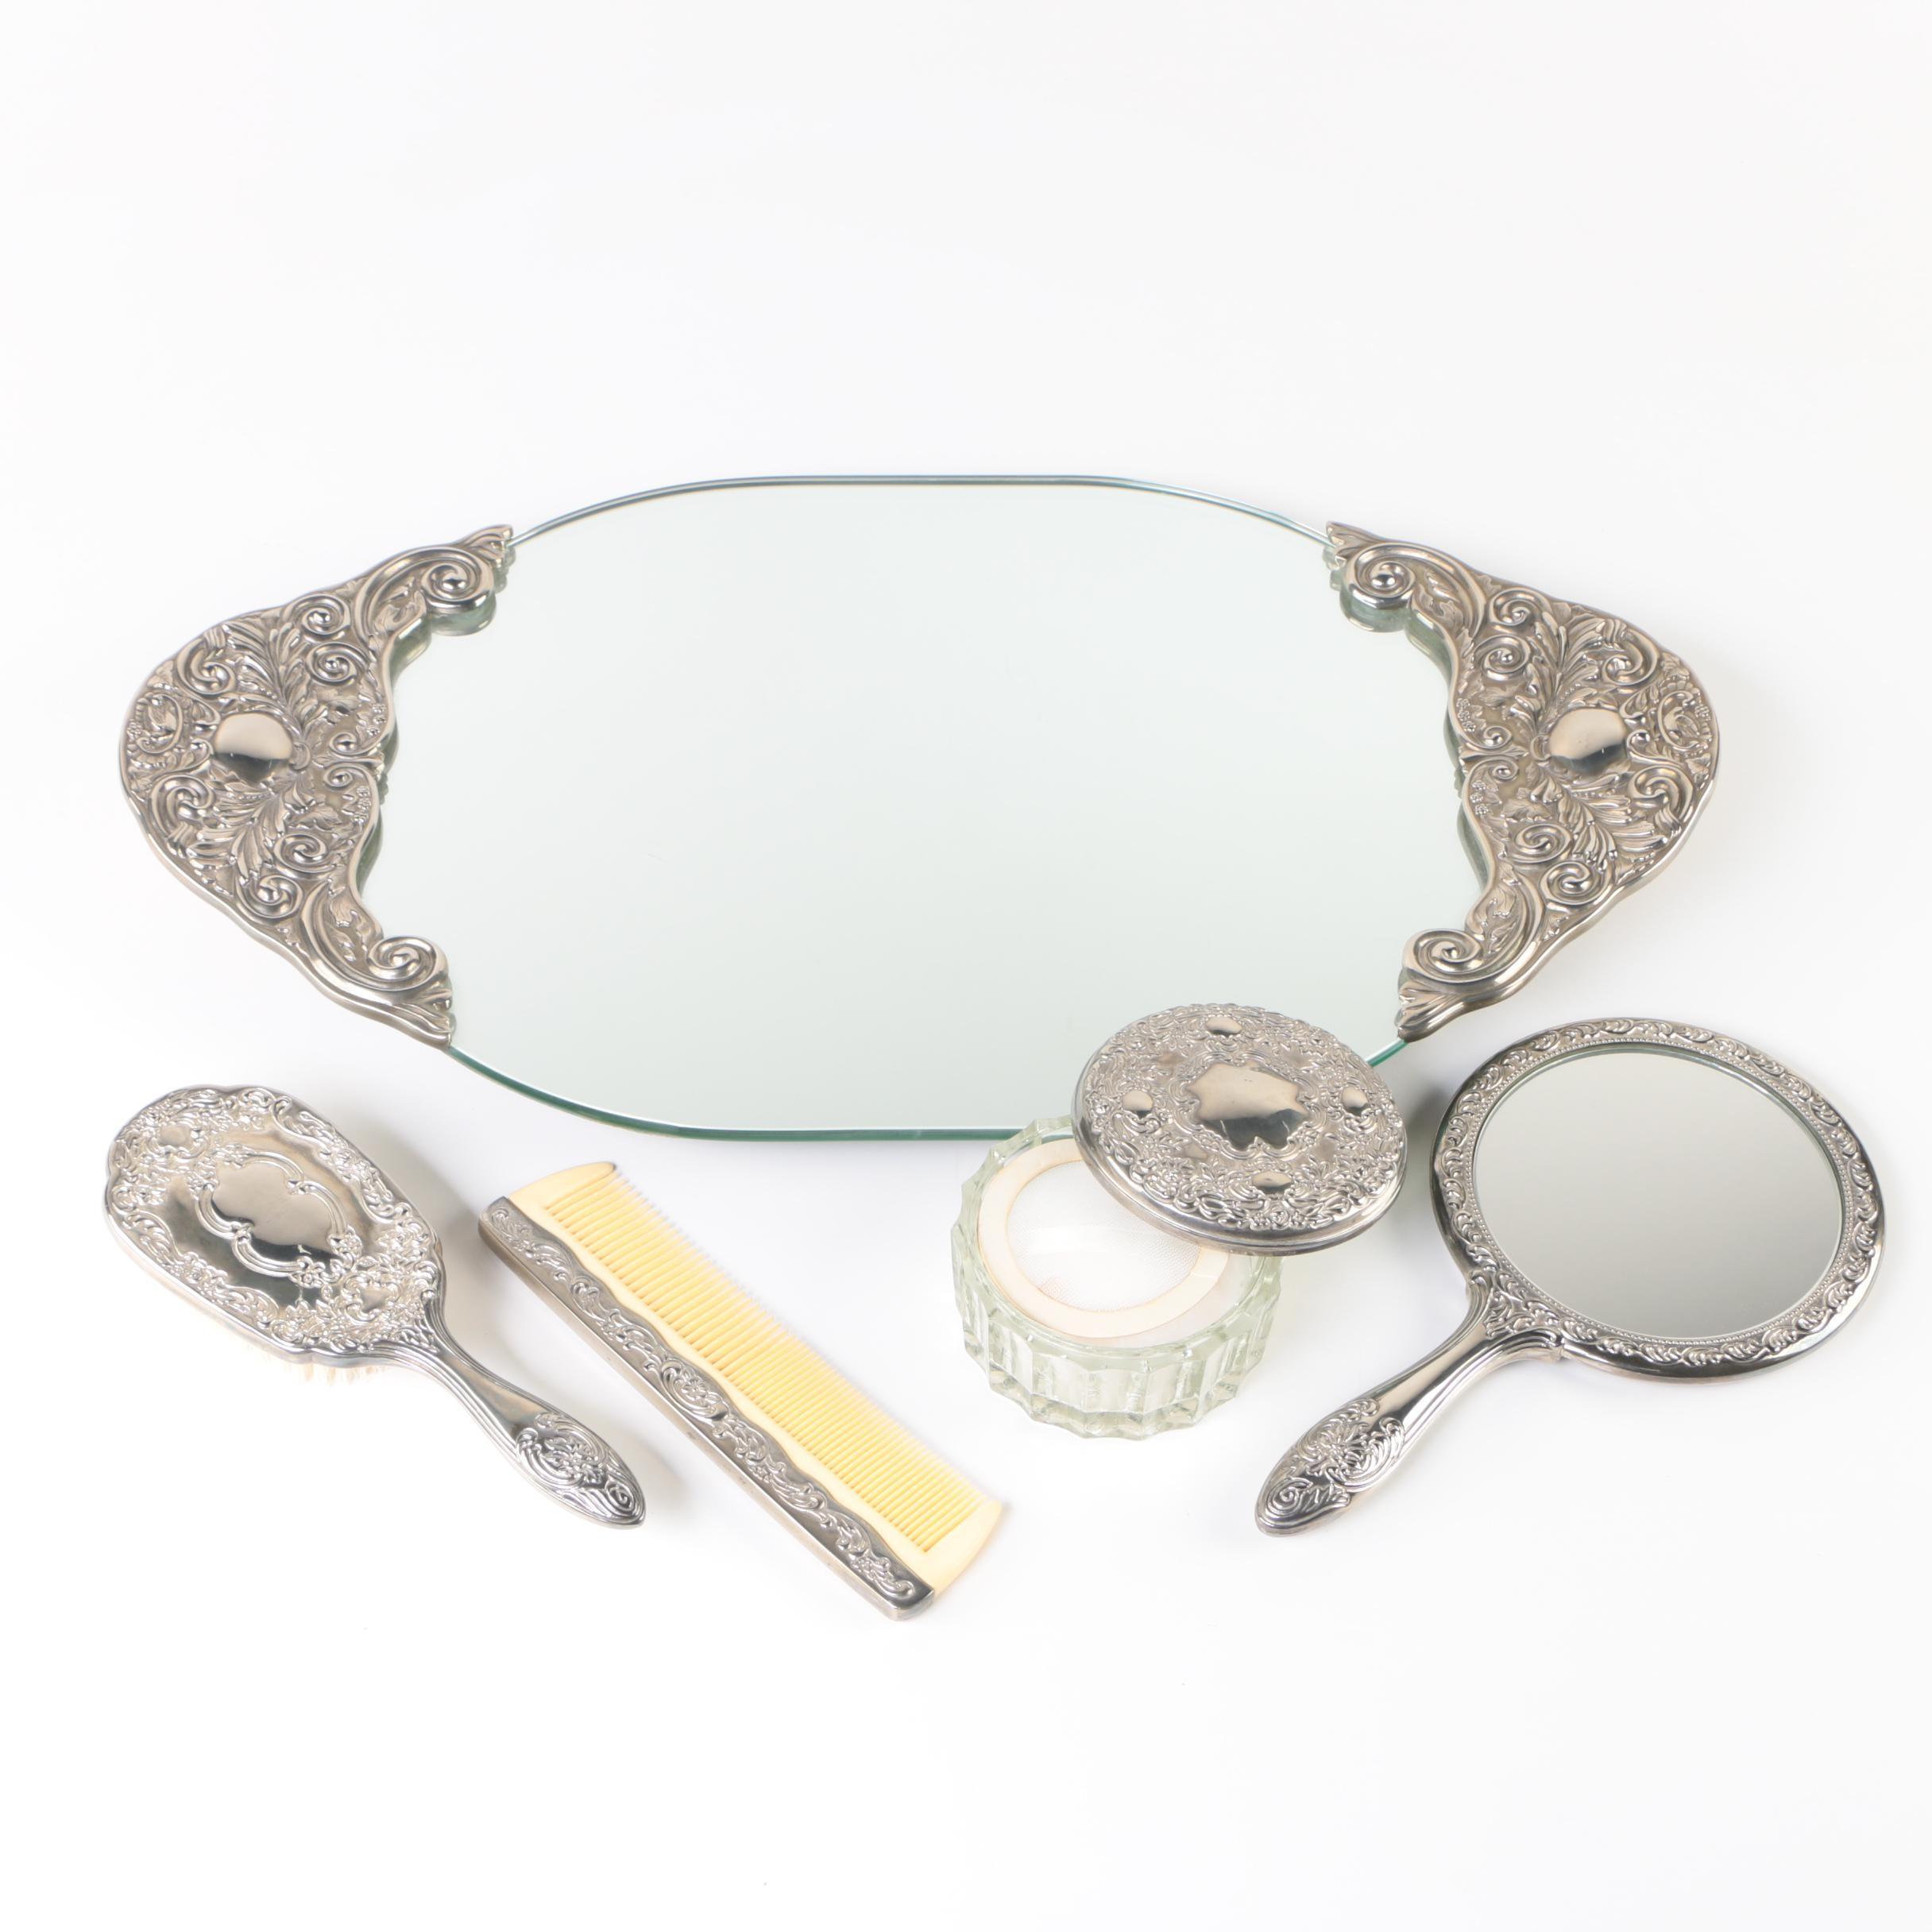 Silver Tone Vanity Set with Mirror Tray